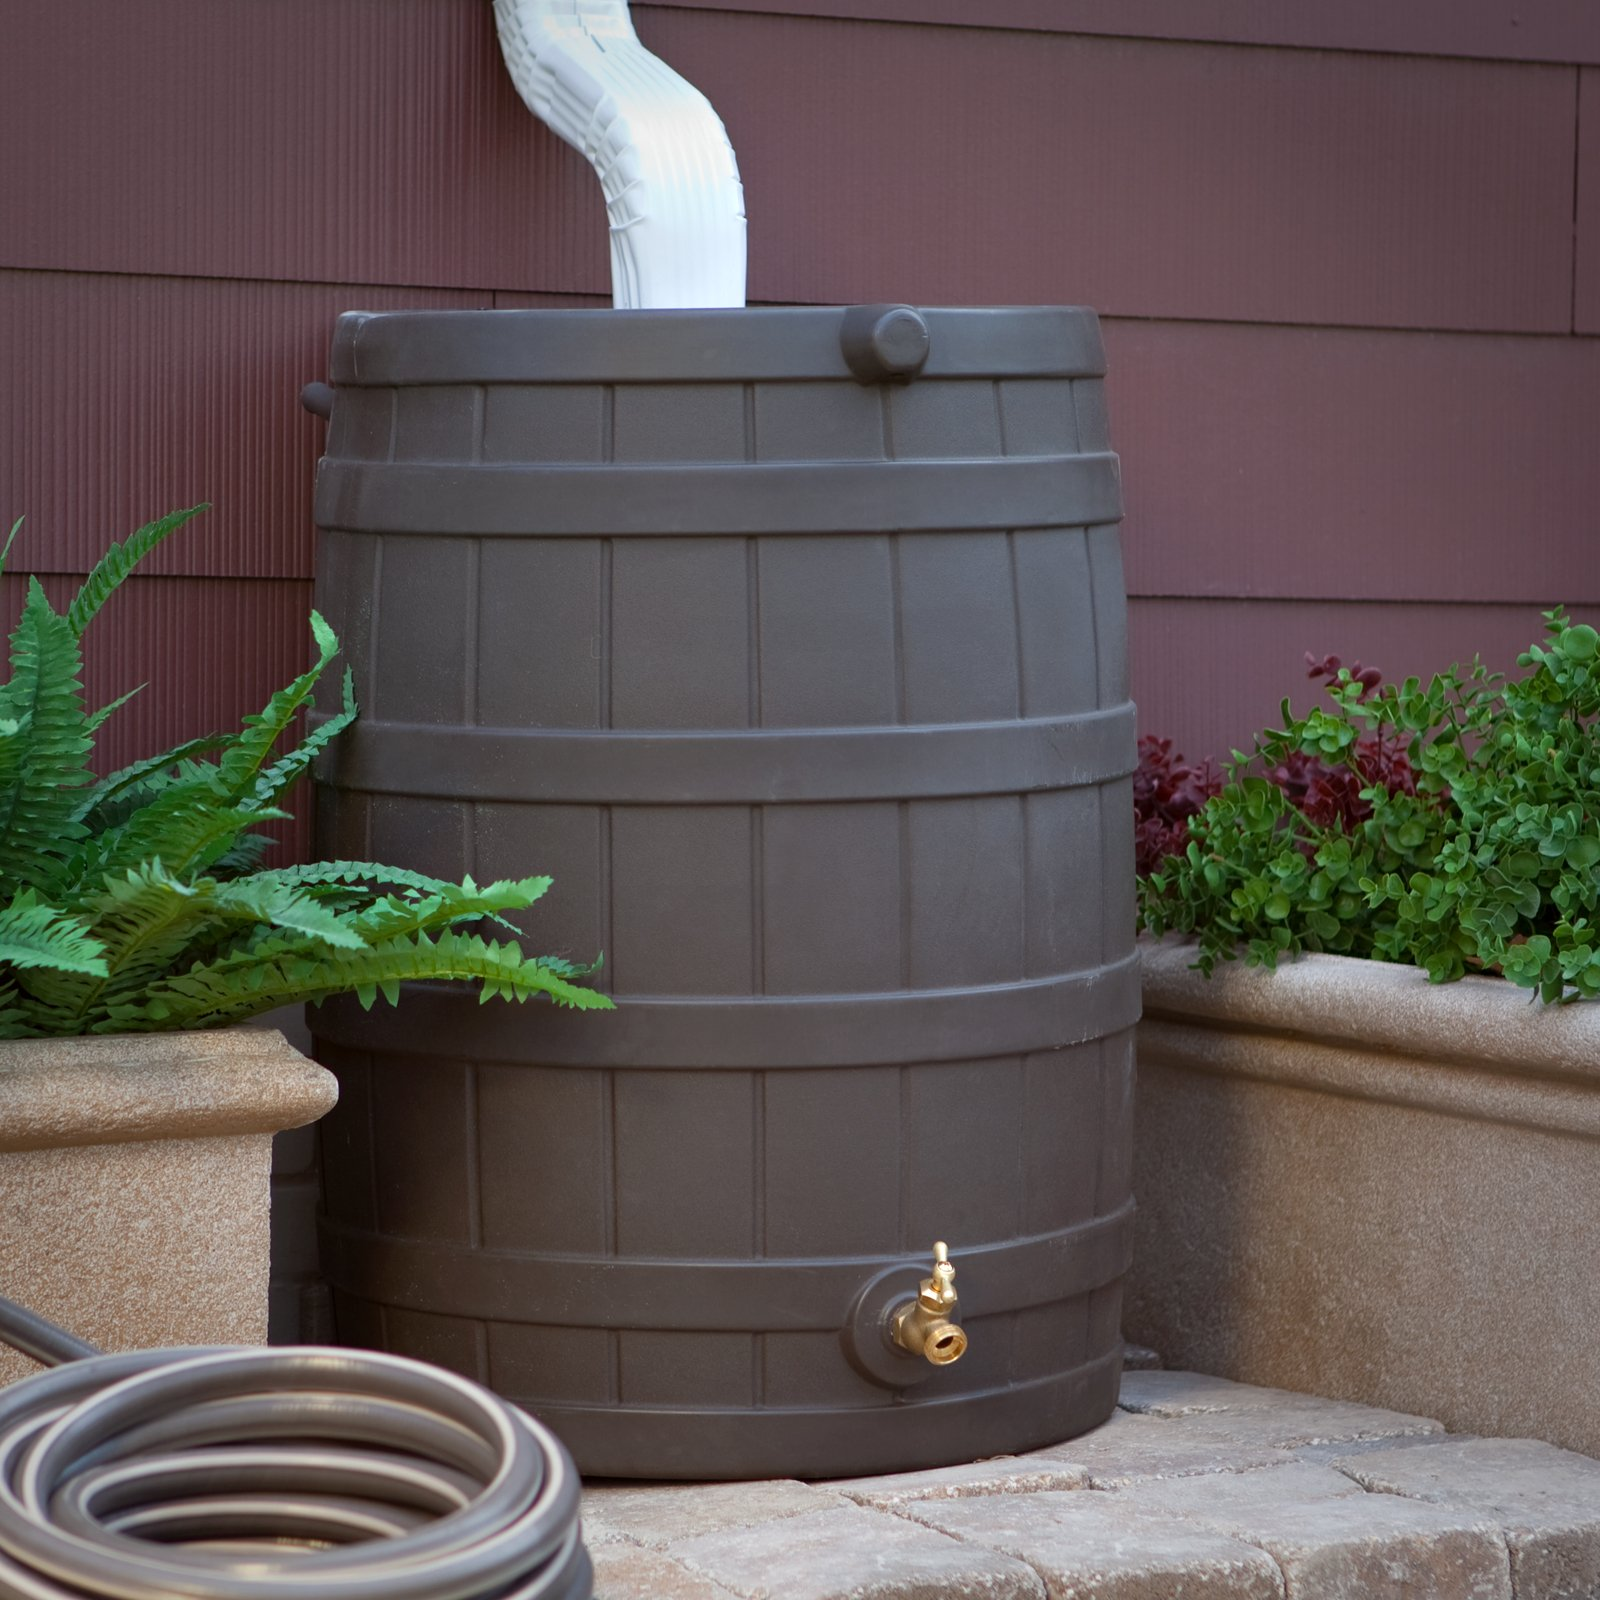 rain-barrel-2.jpg